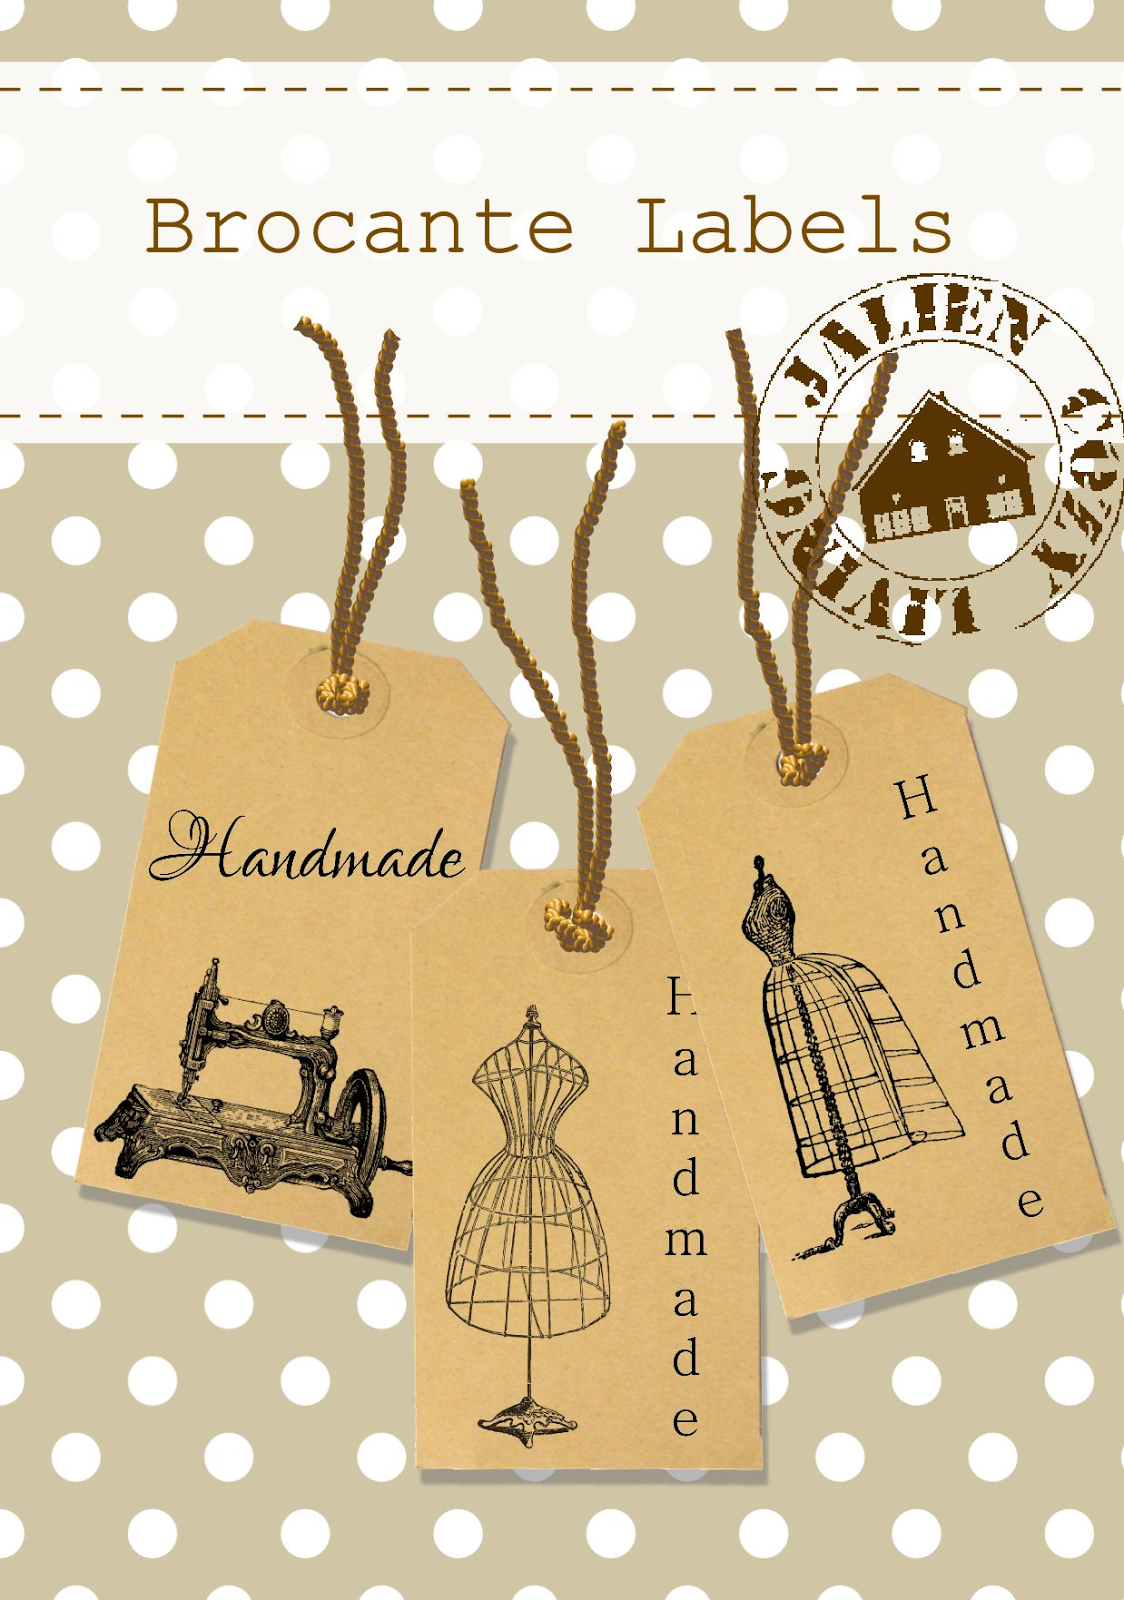 http://www.mijnwebwinkel.nl/winkel/jaliencozyliving/a-38069115/labels/brocante-handmade-labels/